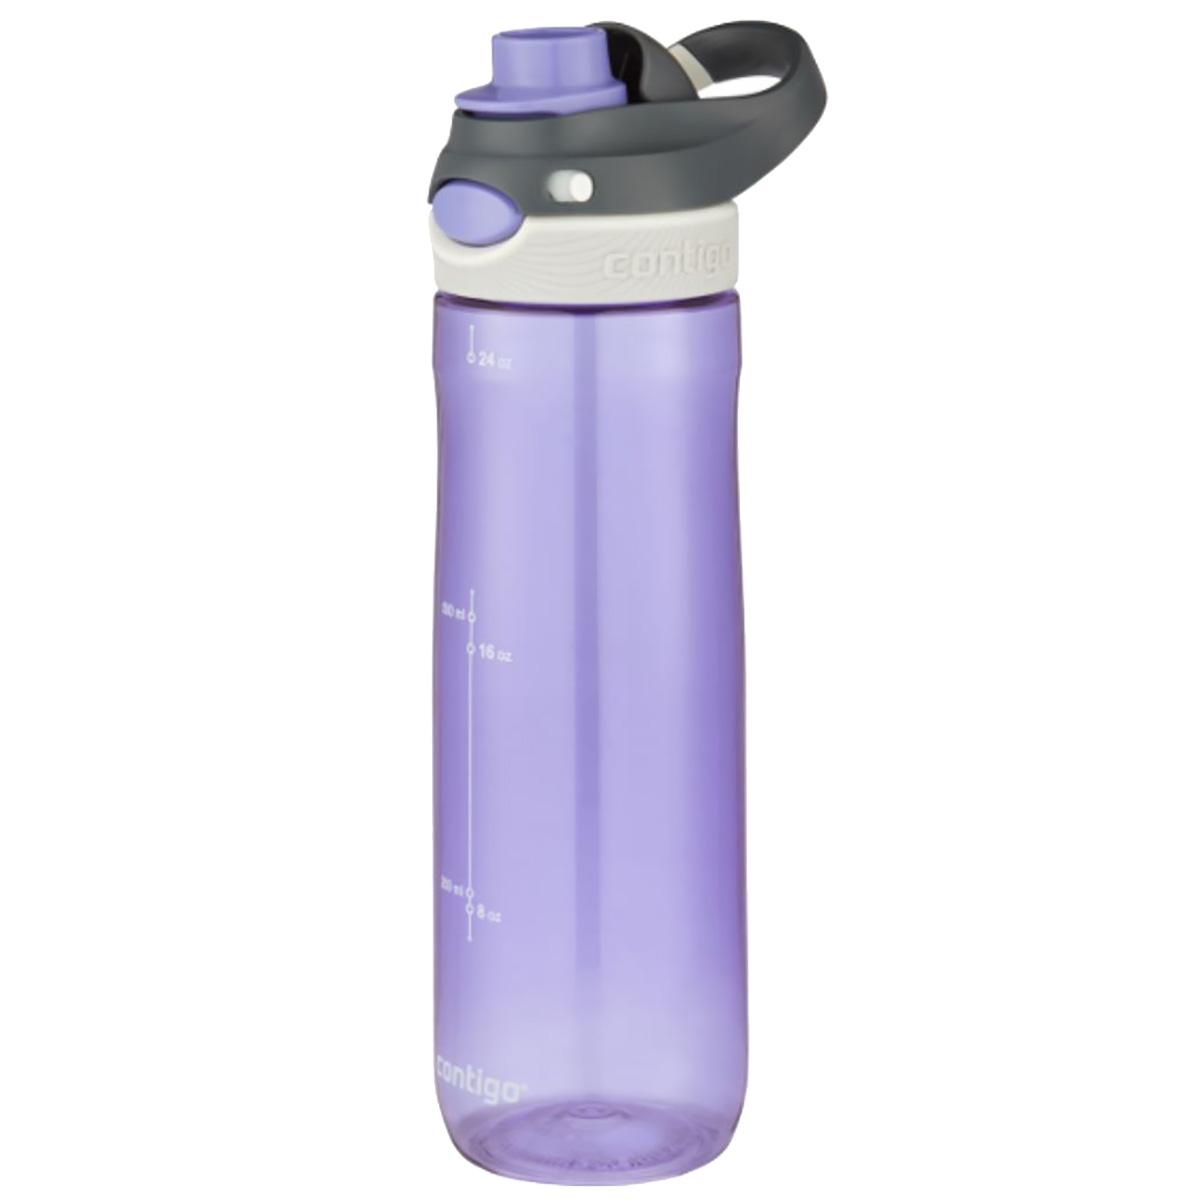 Contigo-24-oz-Chug-Autospout-Leak-Proof-Water-Bottle miniatuur 5